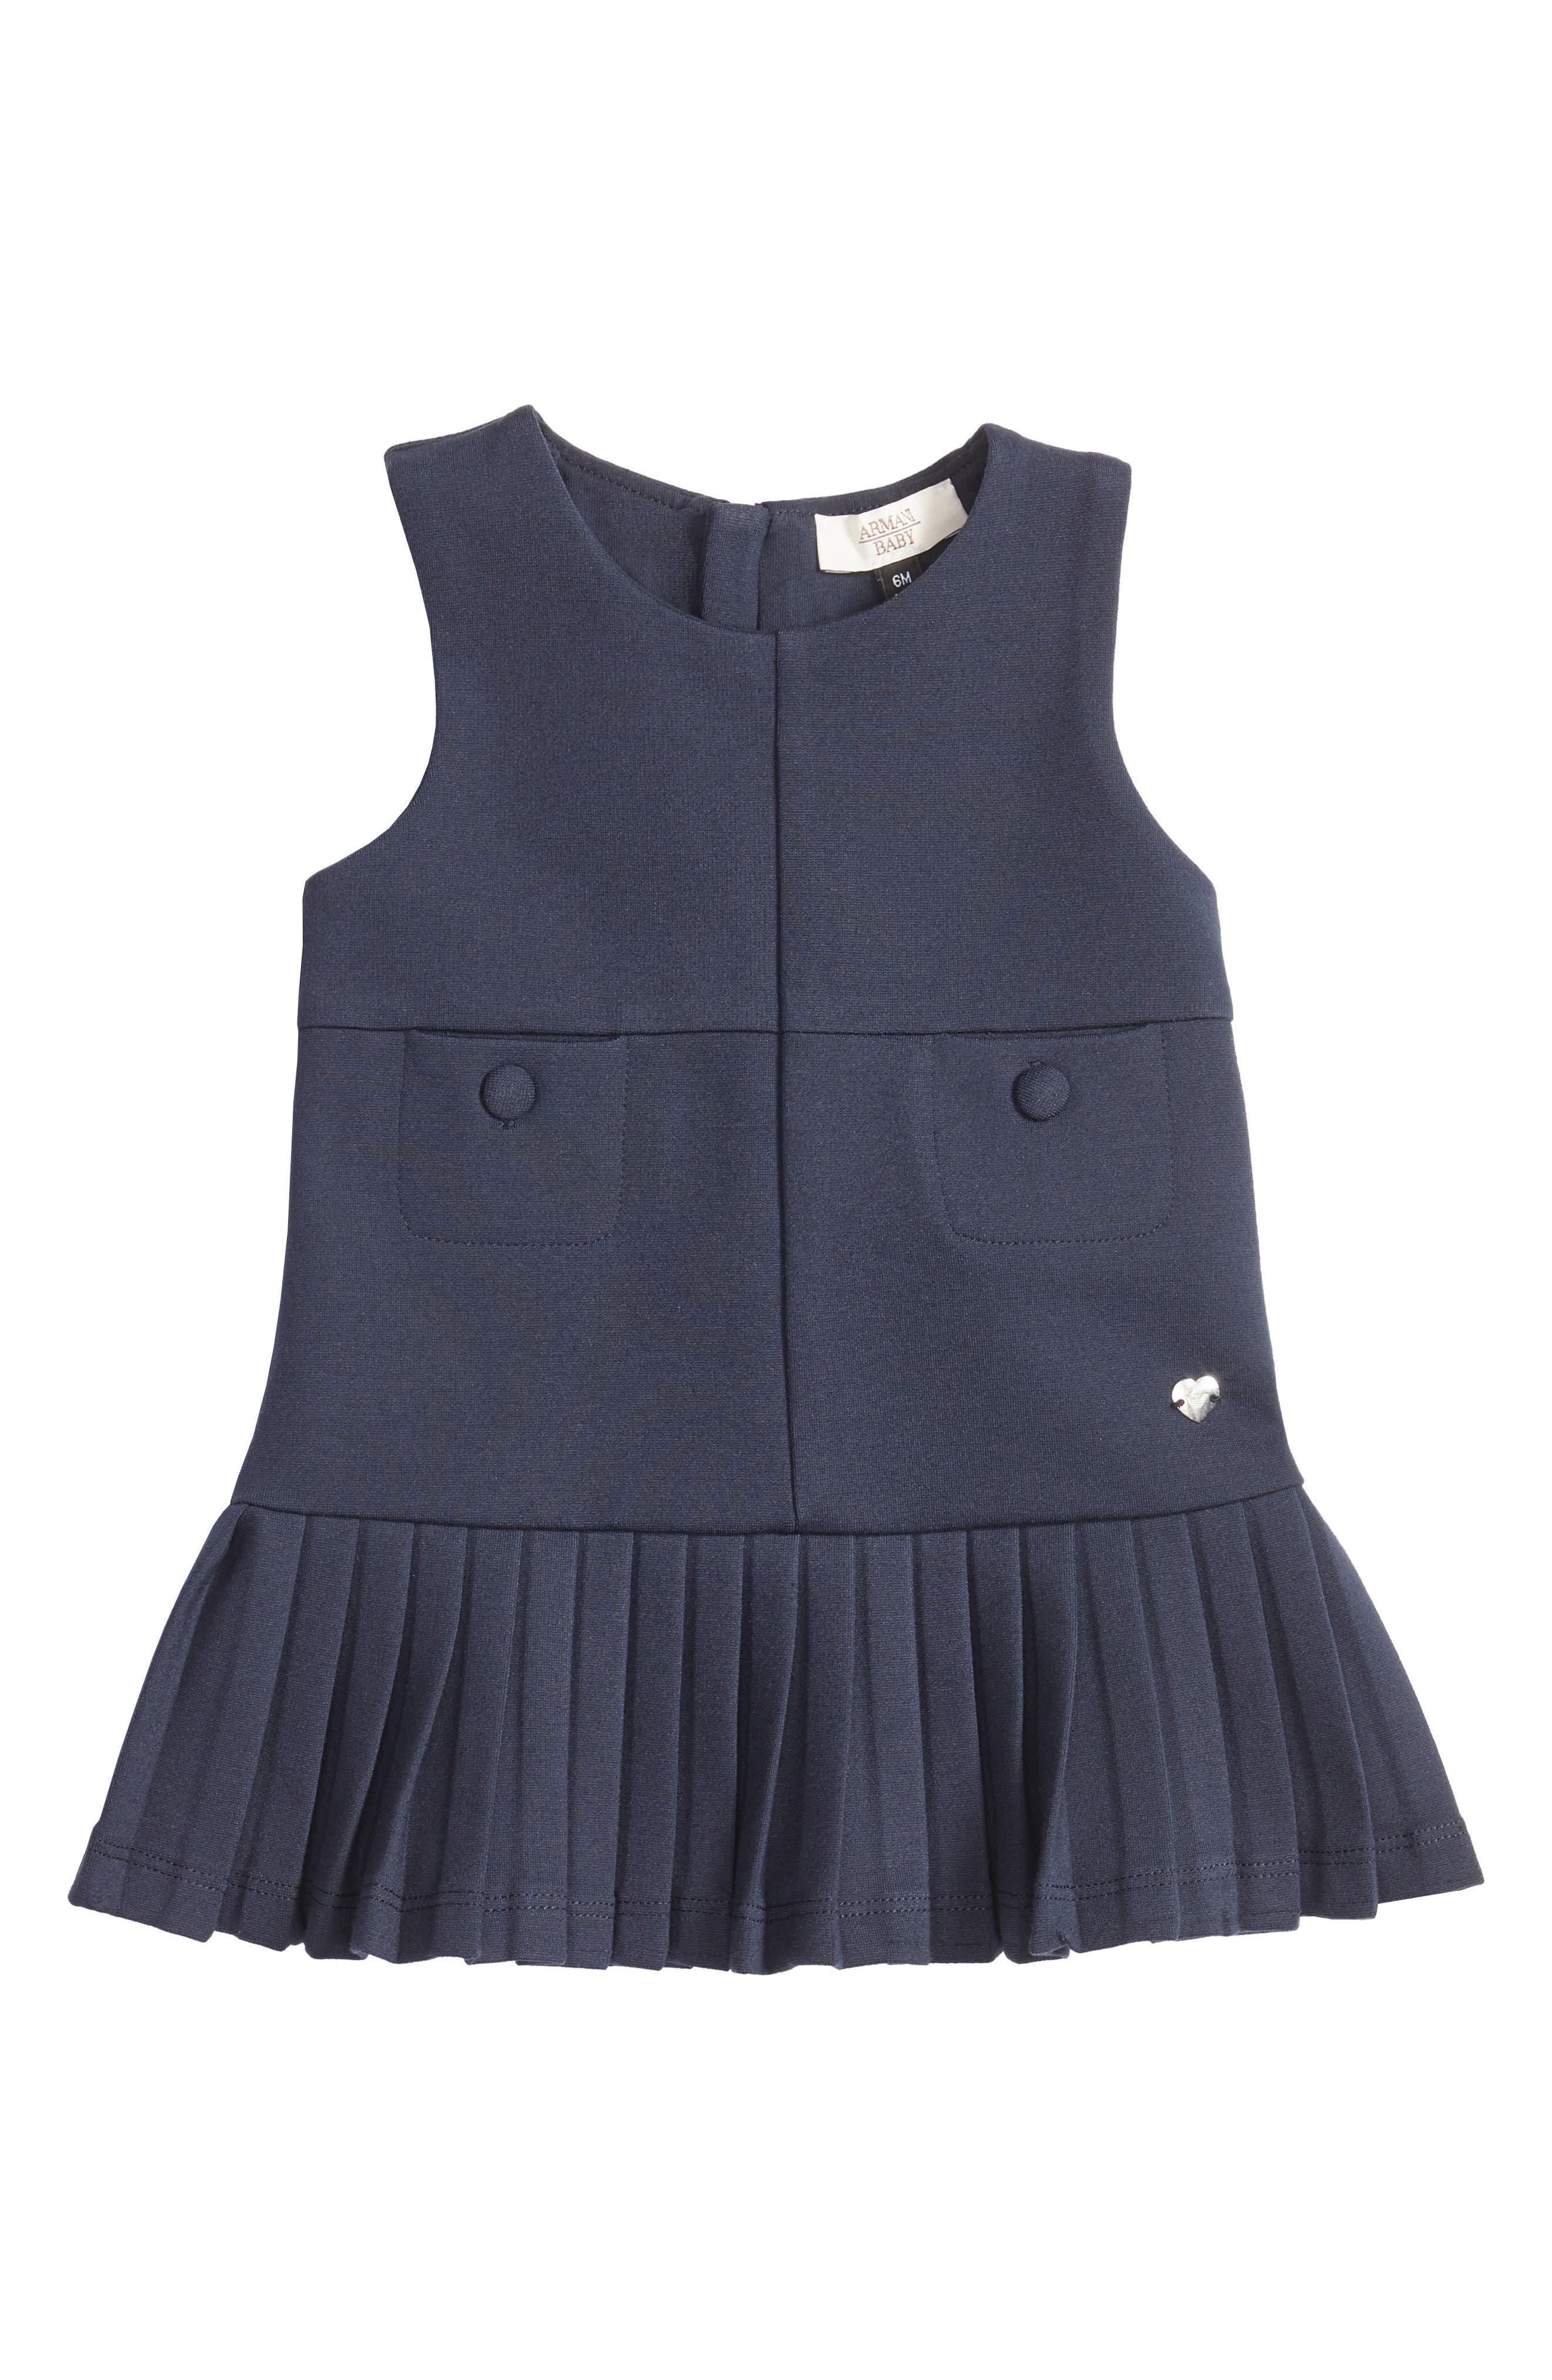 Sleeveless Jersey Dress,                             Main thumbnail 1, color,                             Navy Blue